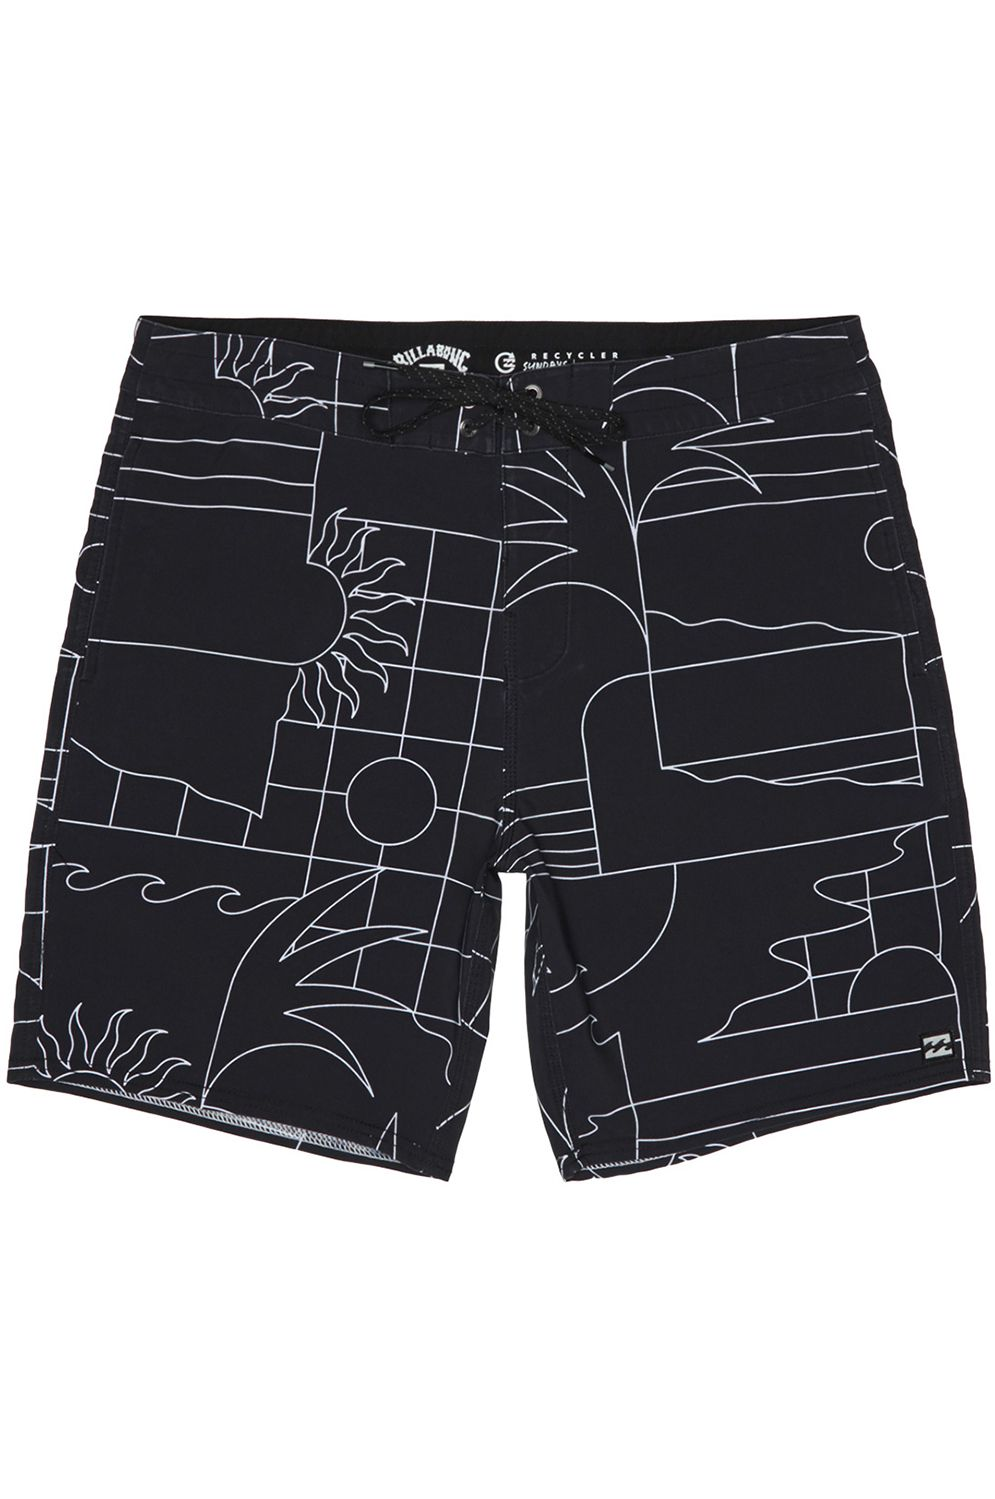 Boardshorts Billabong SUNDAYS LT Black